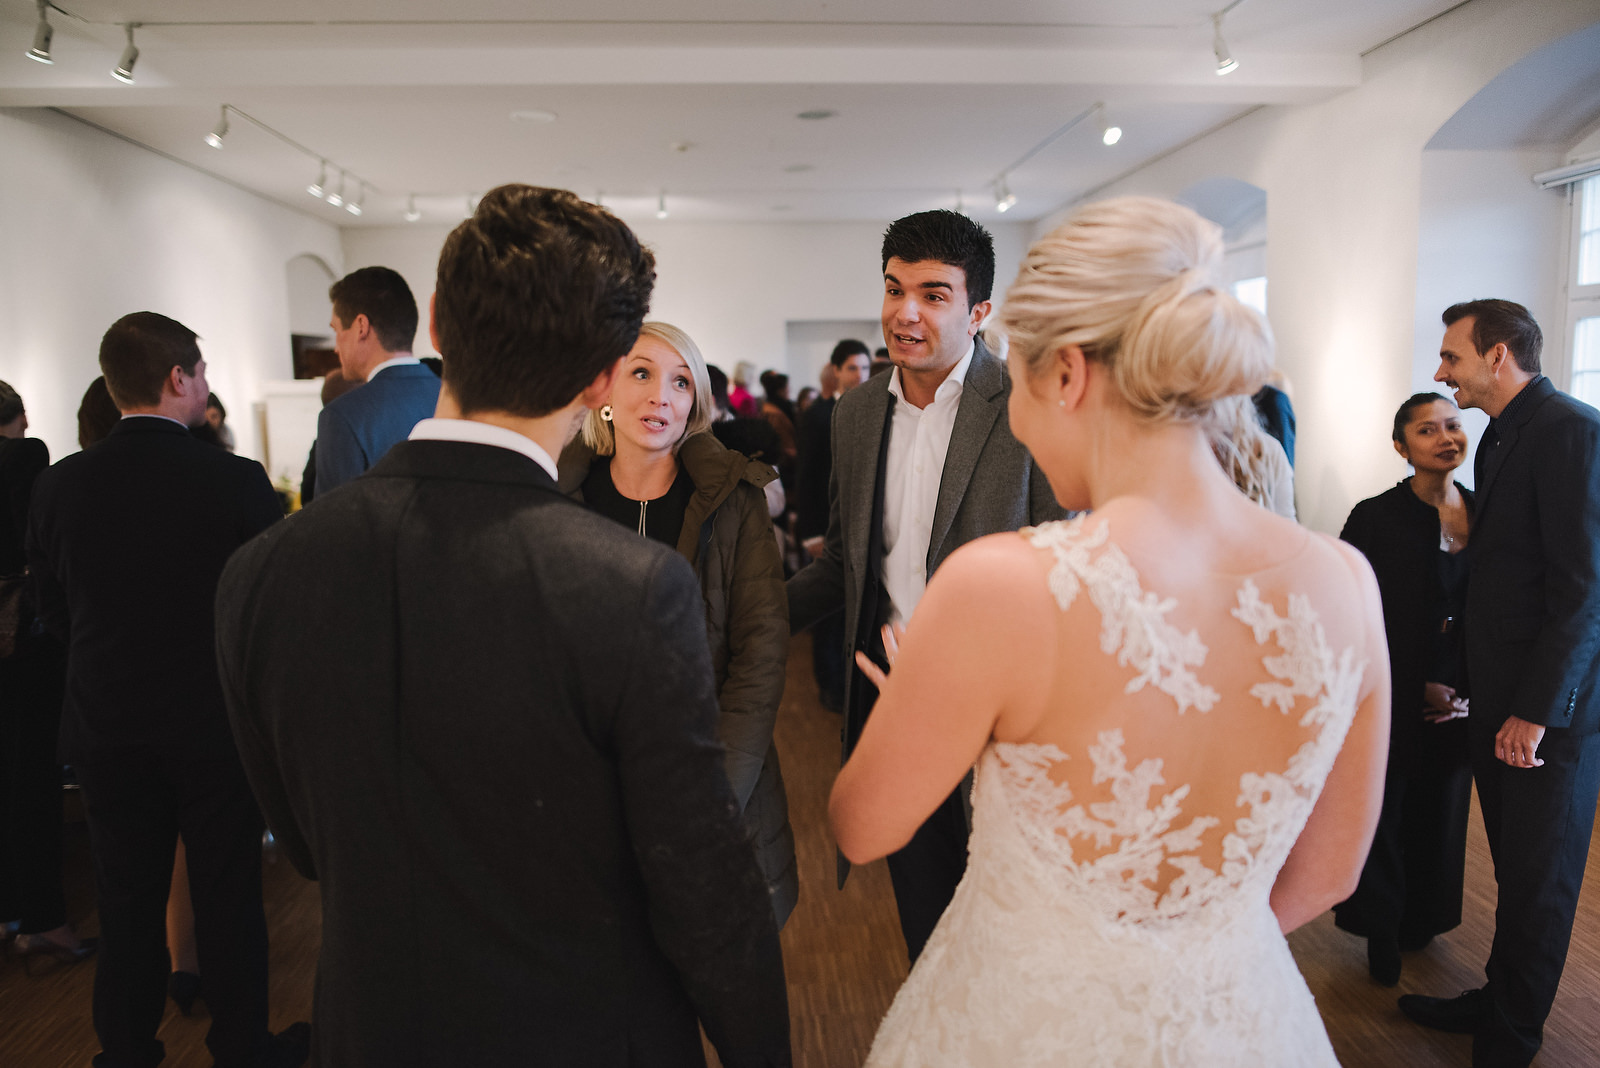 Fotograf Konstanz - Silvester Wedding in Hagnau / Friedrichshafen at Lake of Constance  - 27 -